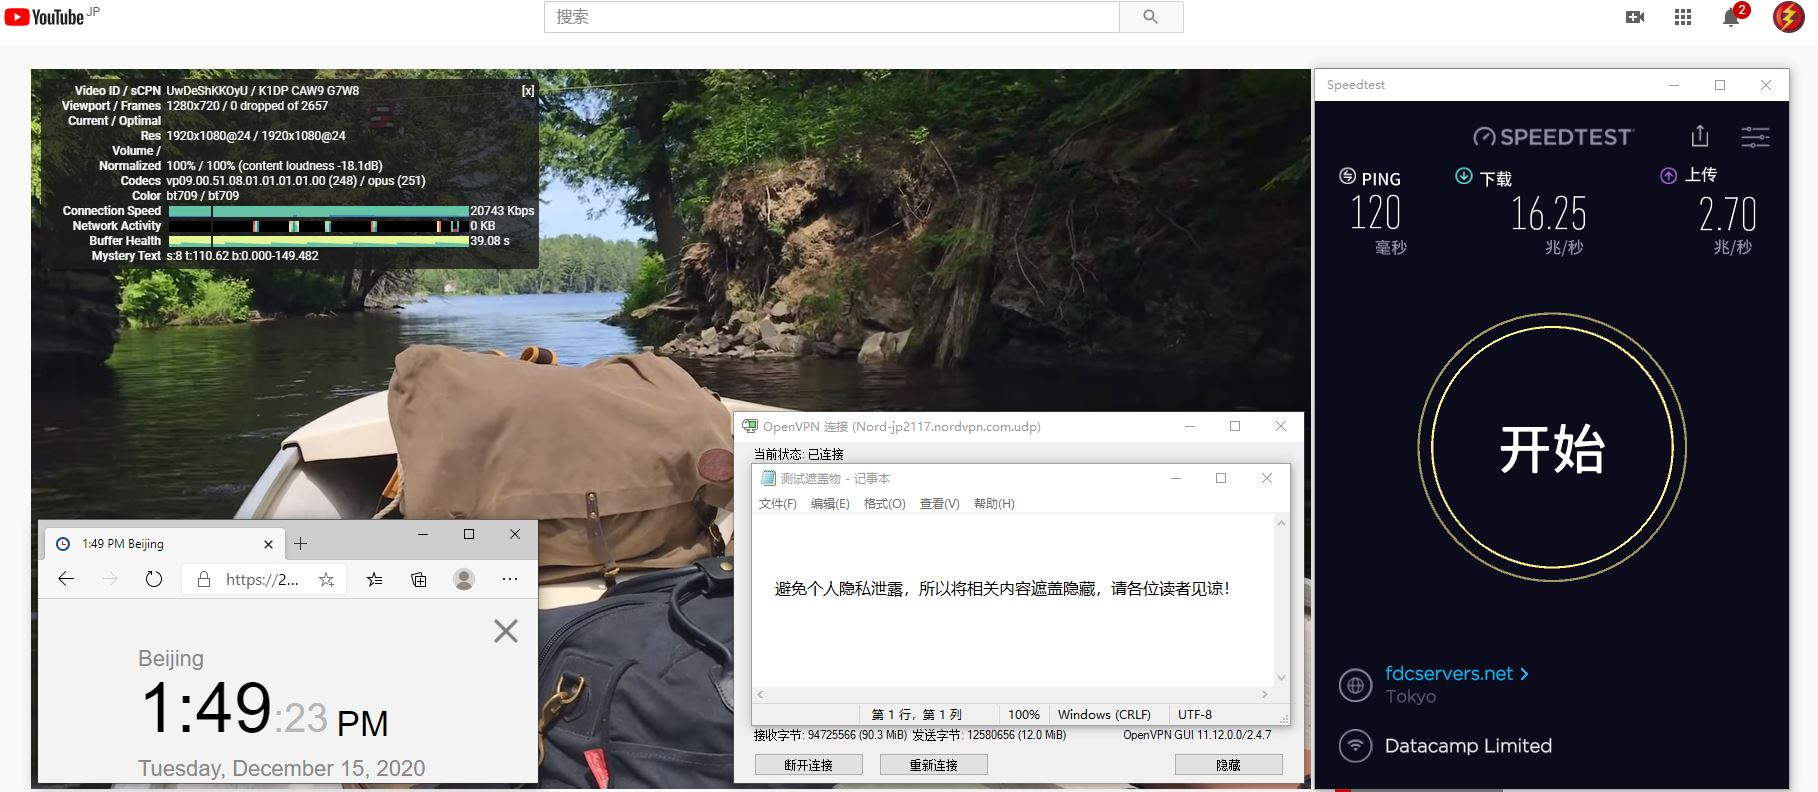 Windows10 NordVPN OpenVPN Gui JP2117 服务器 中国VPN 翻墙 科学上网 测试 - 20201215